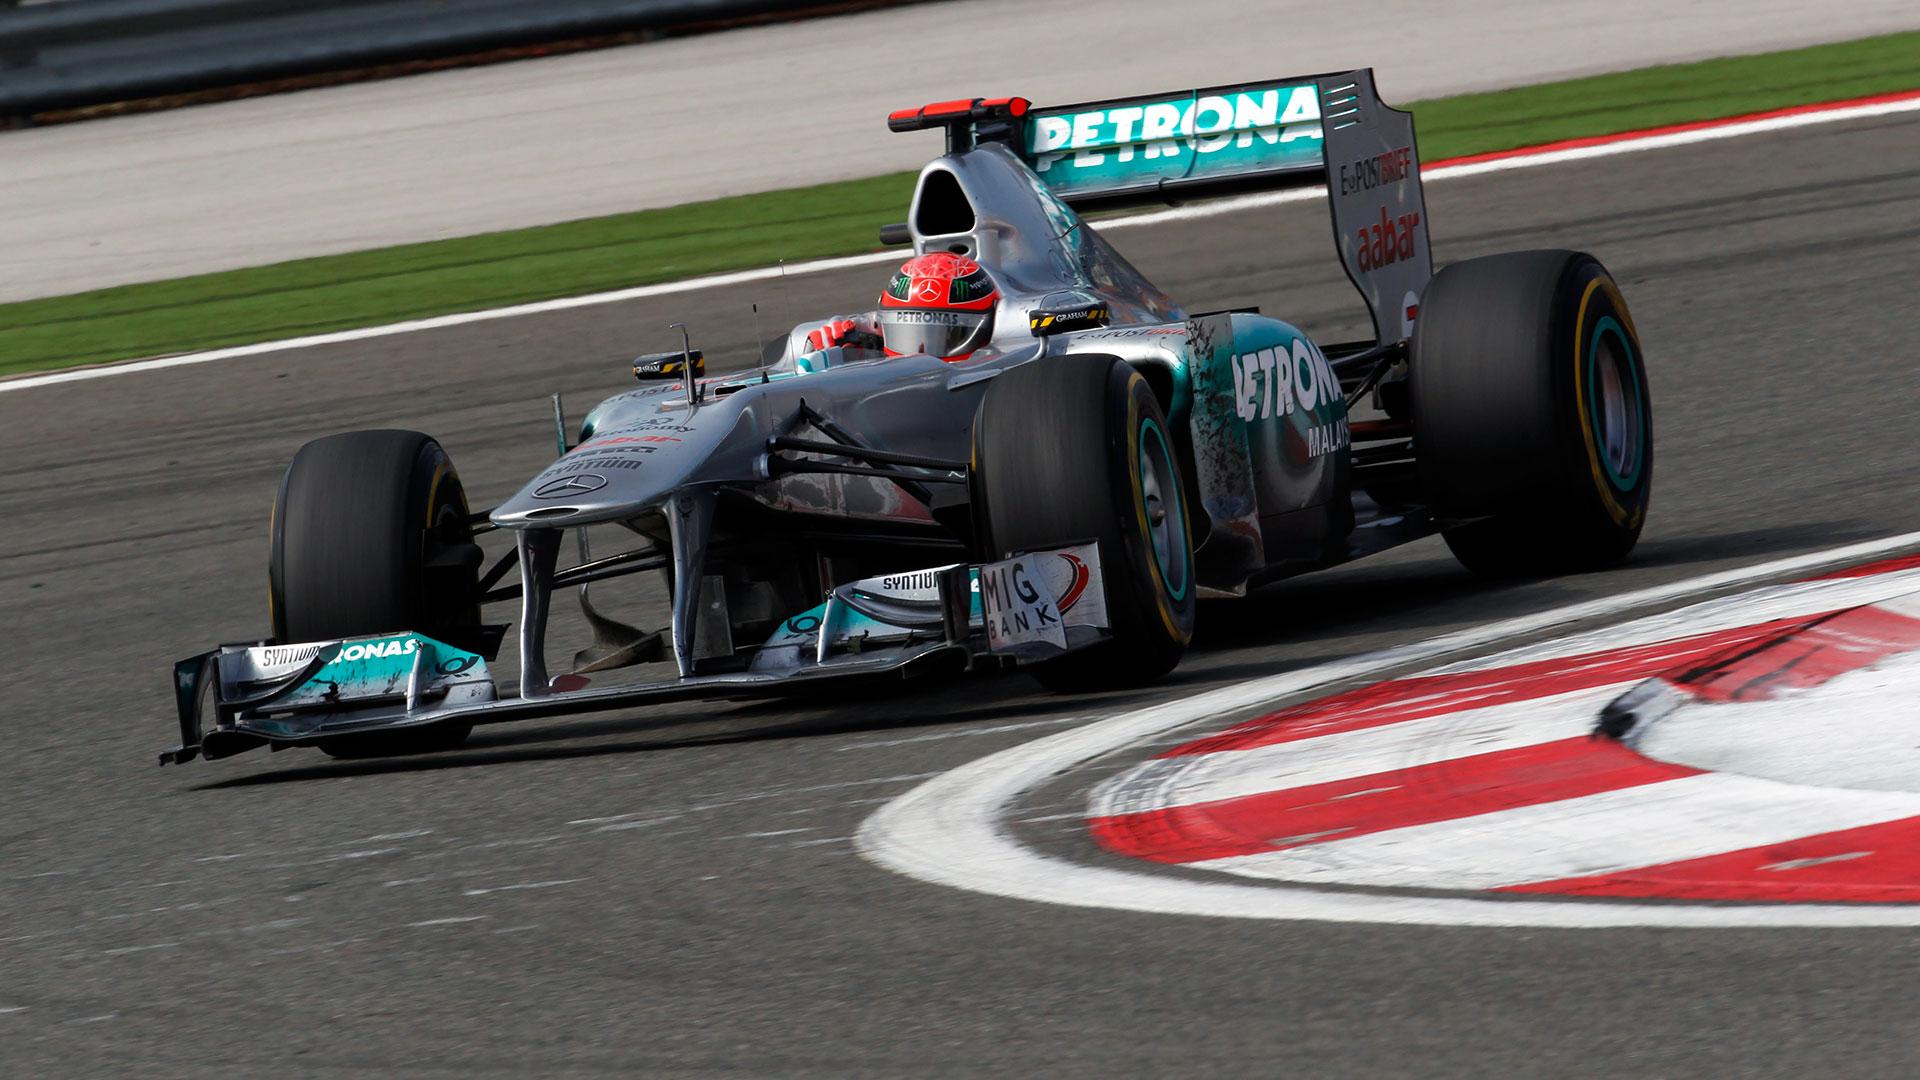 Schumacher Mercedes F1 Full Hd Wallpaper: HD Wallpapers 2011 Formula 1 Grand Prix Of Turkey